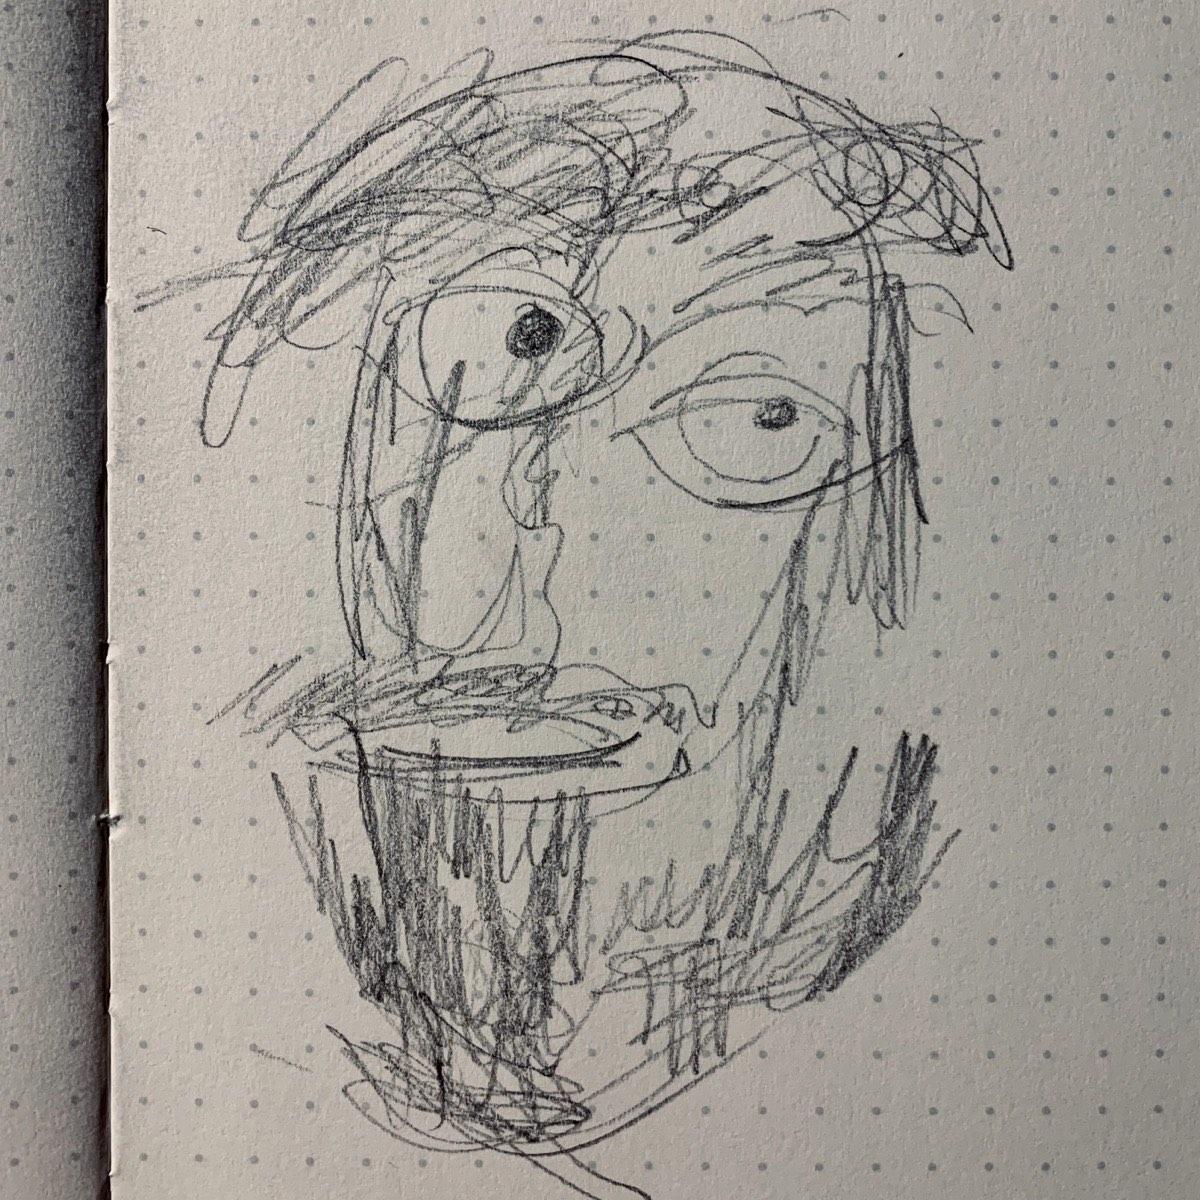 Self portrait, as blind contour drawing.